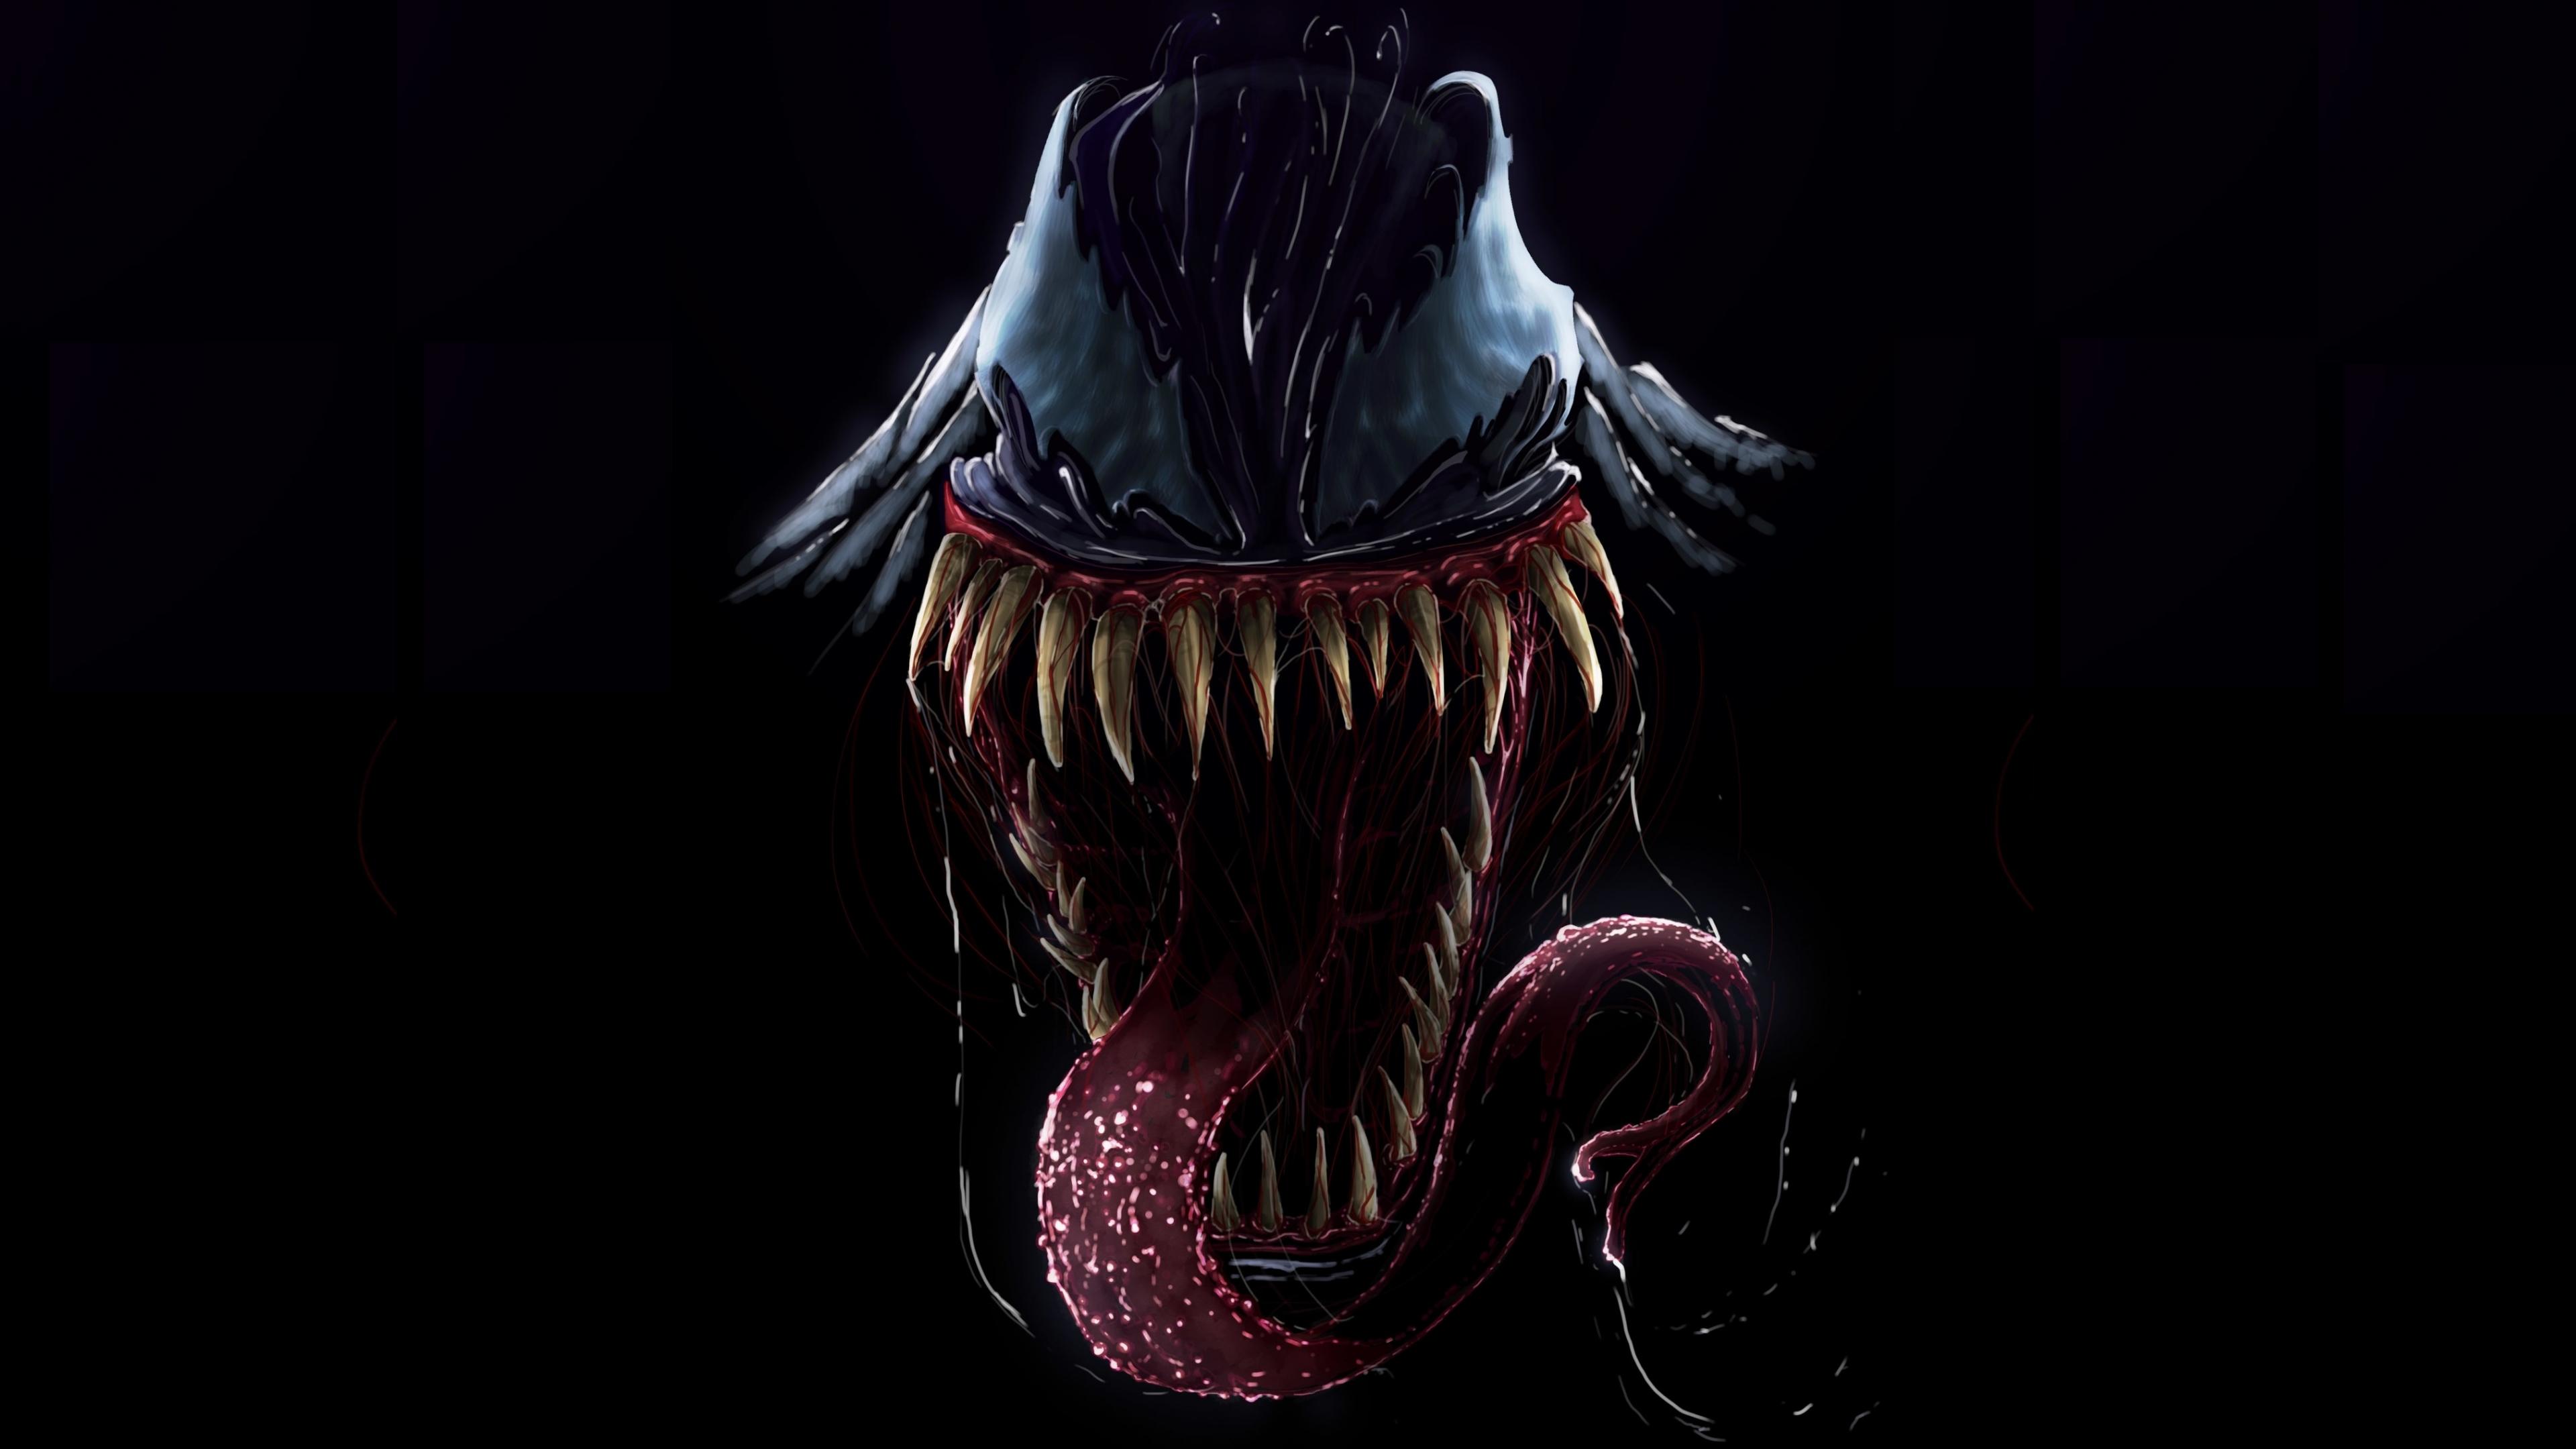 Download 3840x2160 Wallpaper Artwork Villain Venom 4k